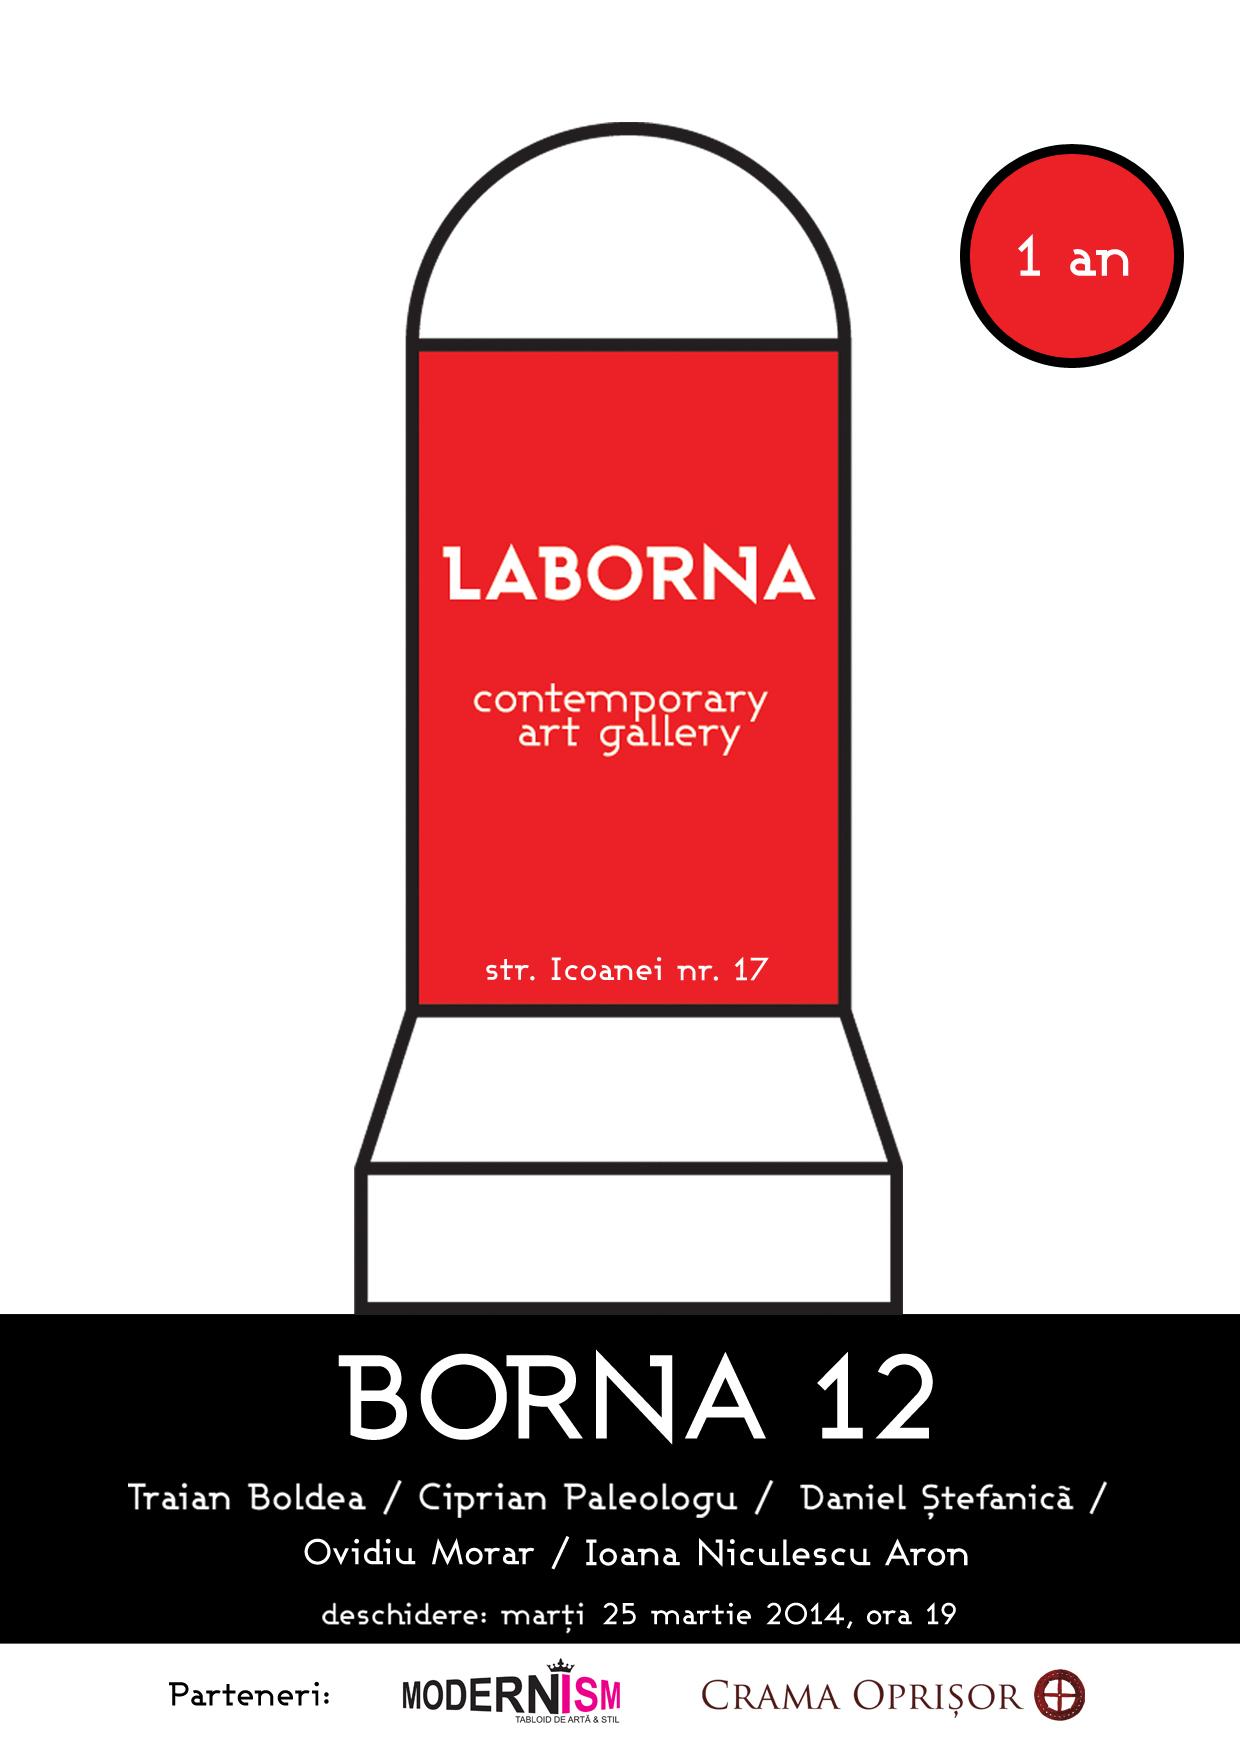 La Borna 12